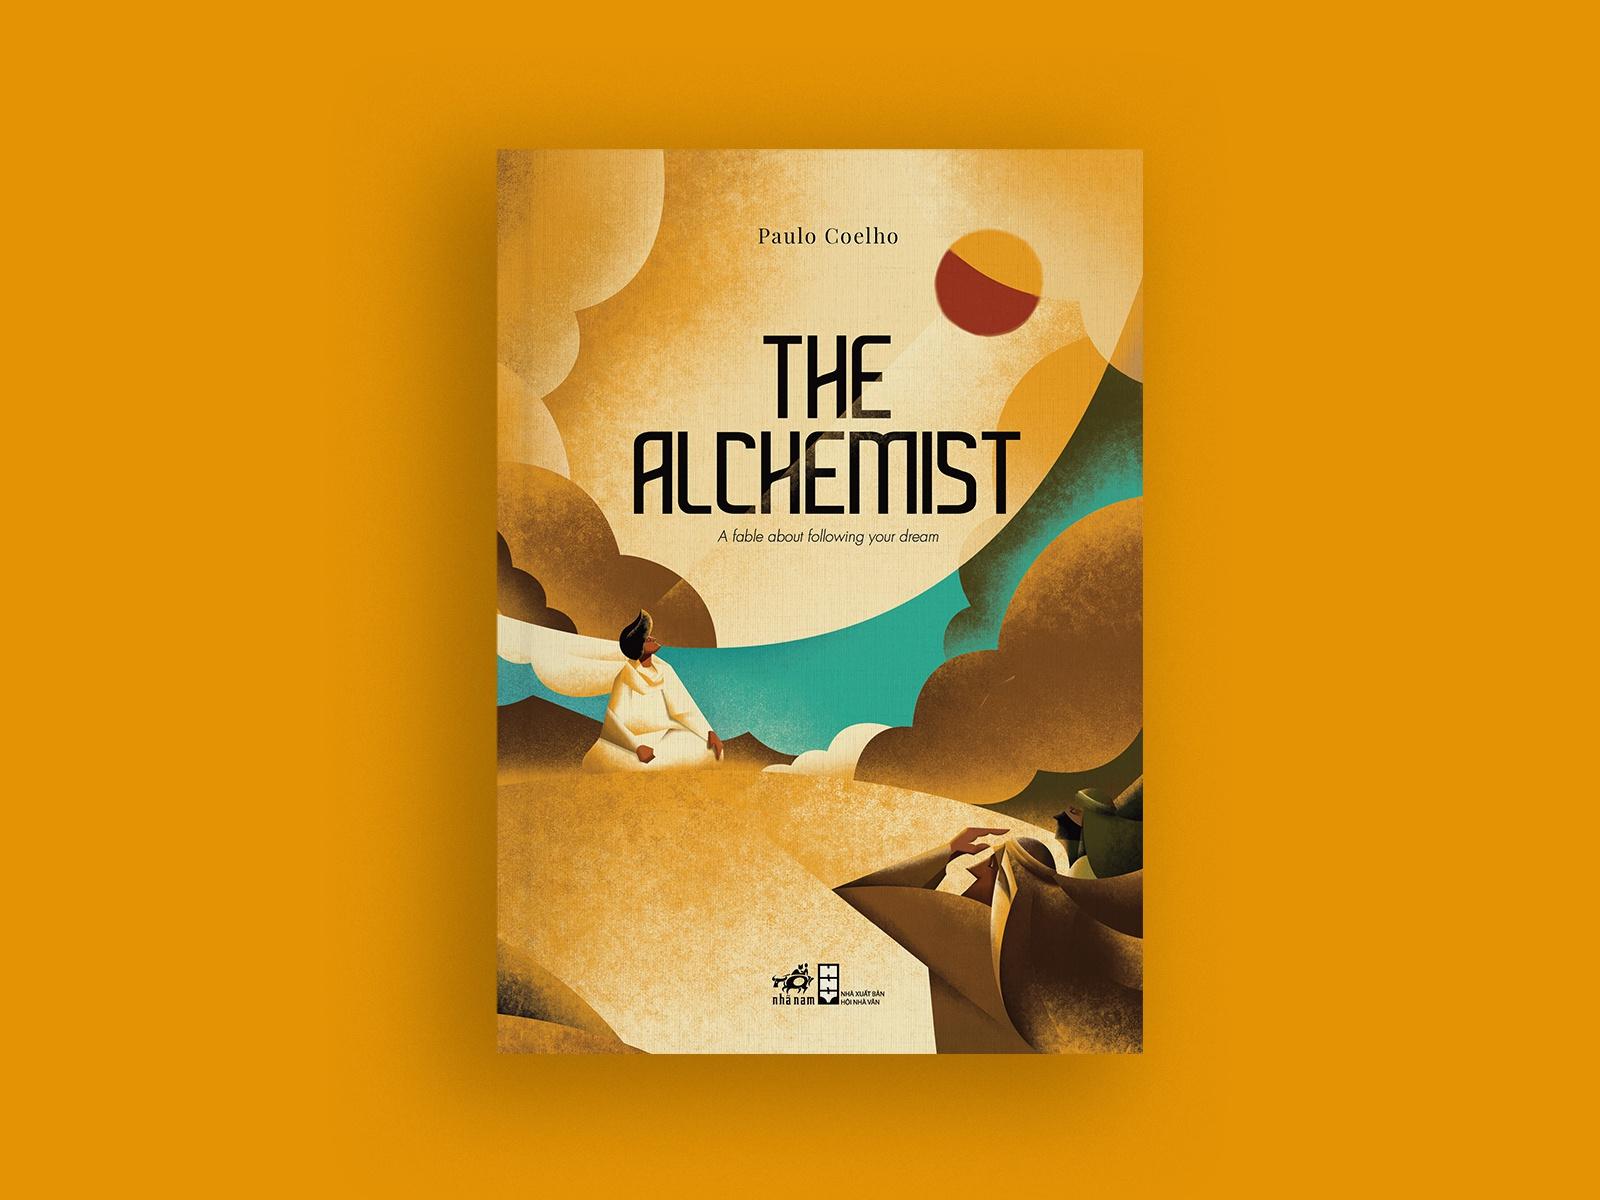 Buku populer berdasarkan latar - The Alchemist